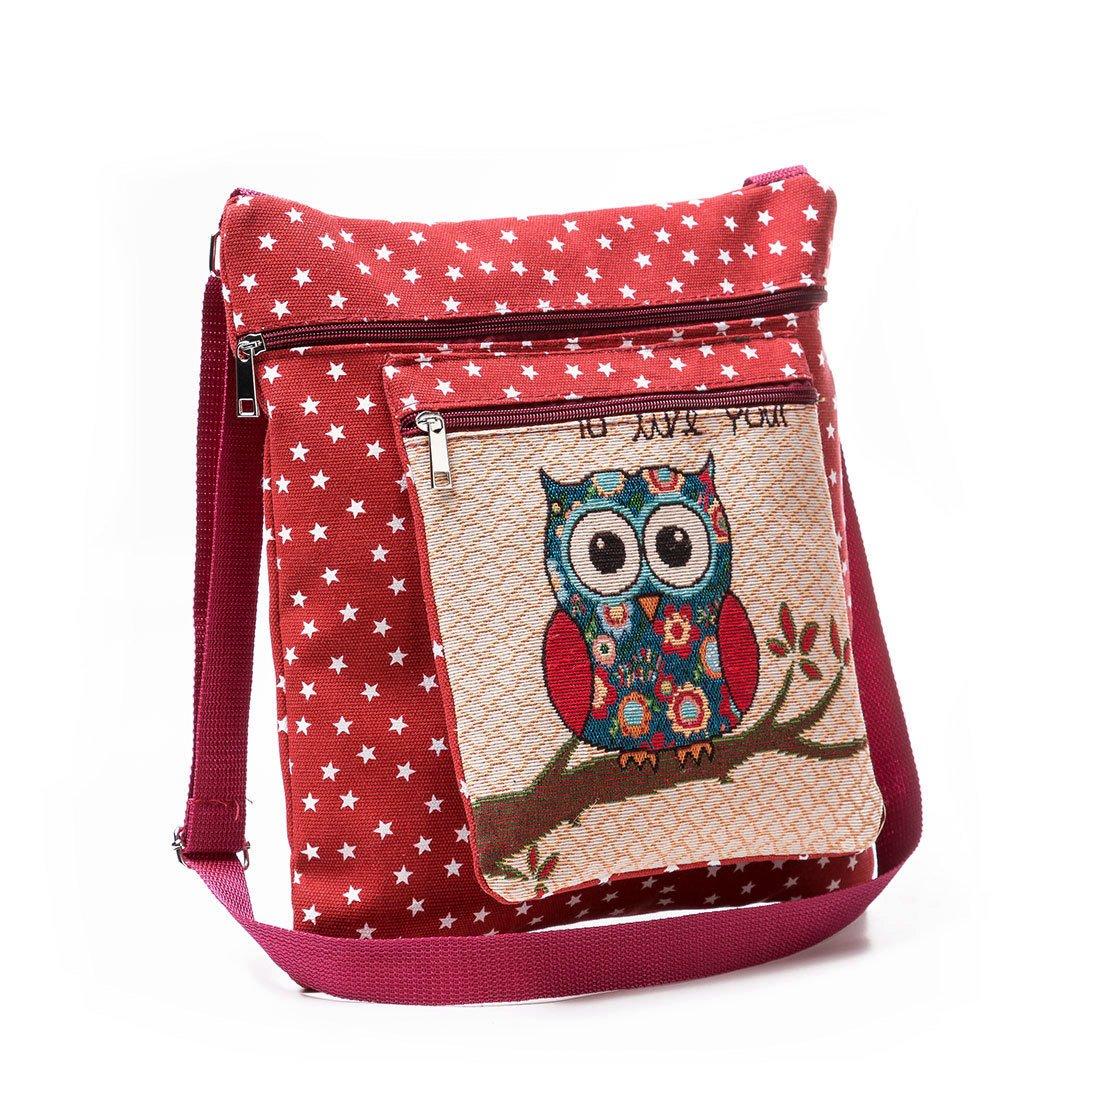 2-layers Satchel Bag, Cute Owl Embroidery Canvas Bag Crossbody Shoulder Bag for Women